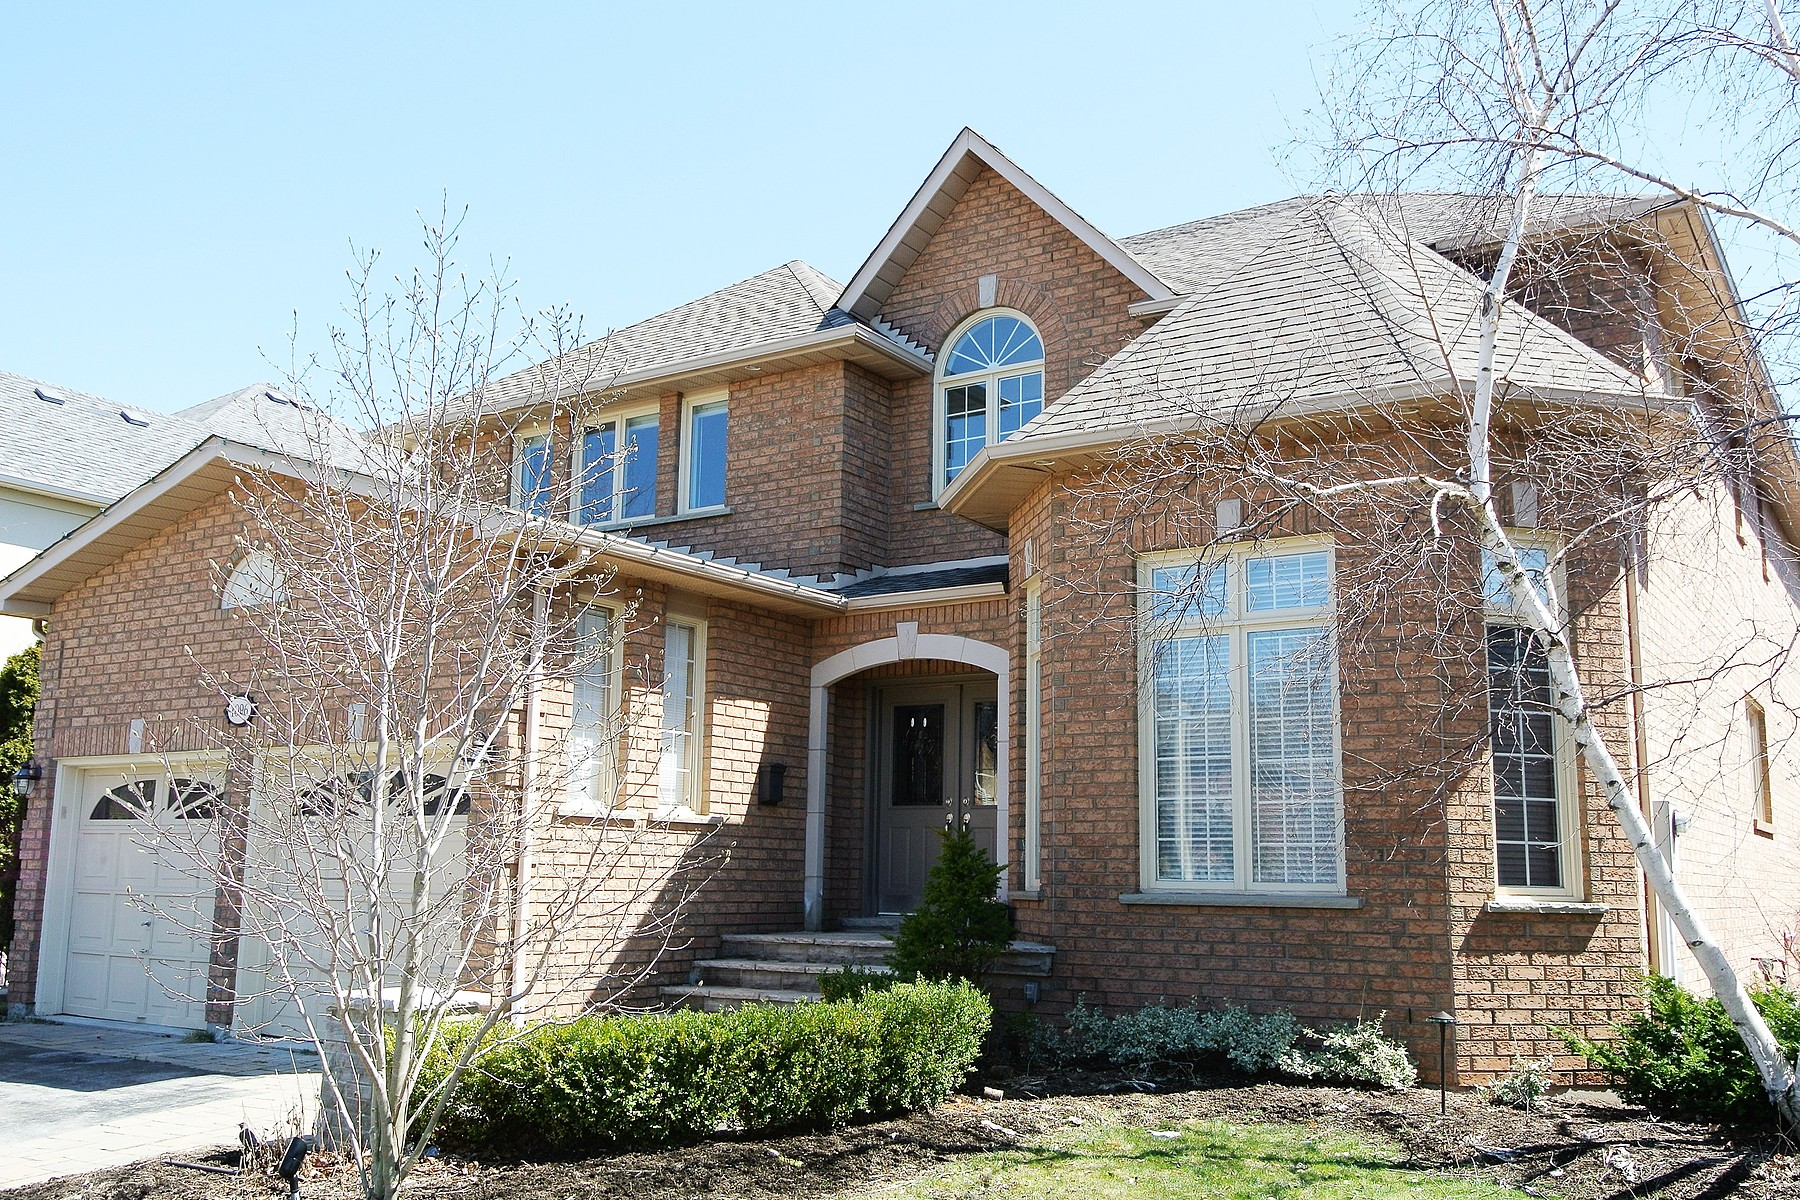 Частный односемейный дом для того Продажа на West Oak Trails - Oakville 1096 Sheltered Oak Crt Oakville, Онтарио, L6M3M6 Канада